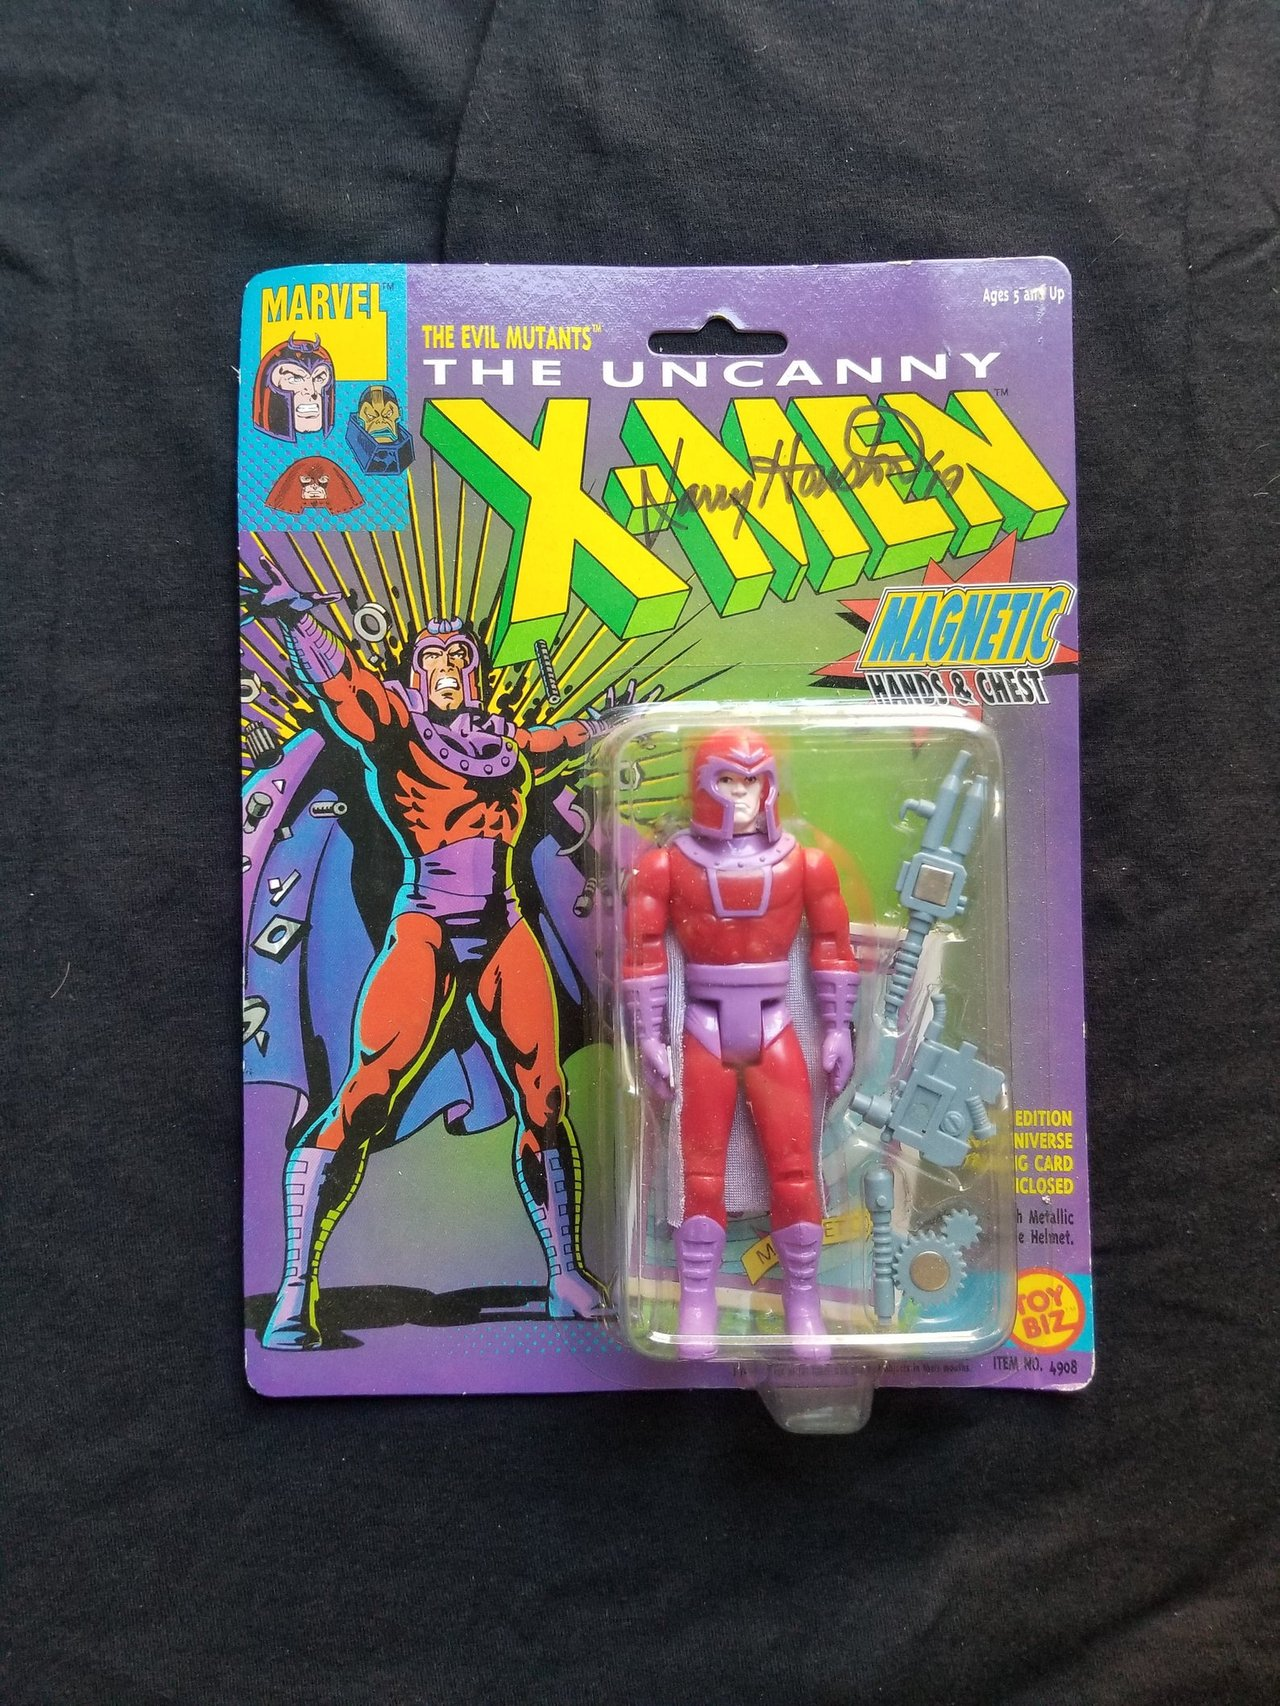 Autographed Toy Biz Magneto Marvel Uncanny X-Men Vintage Signed Action Figure Animated Series